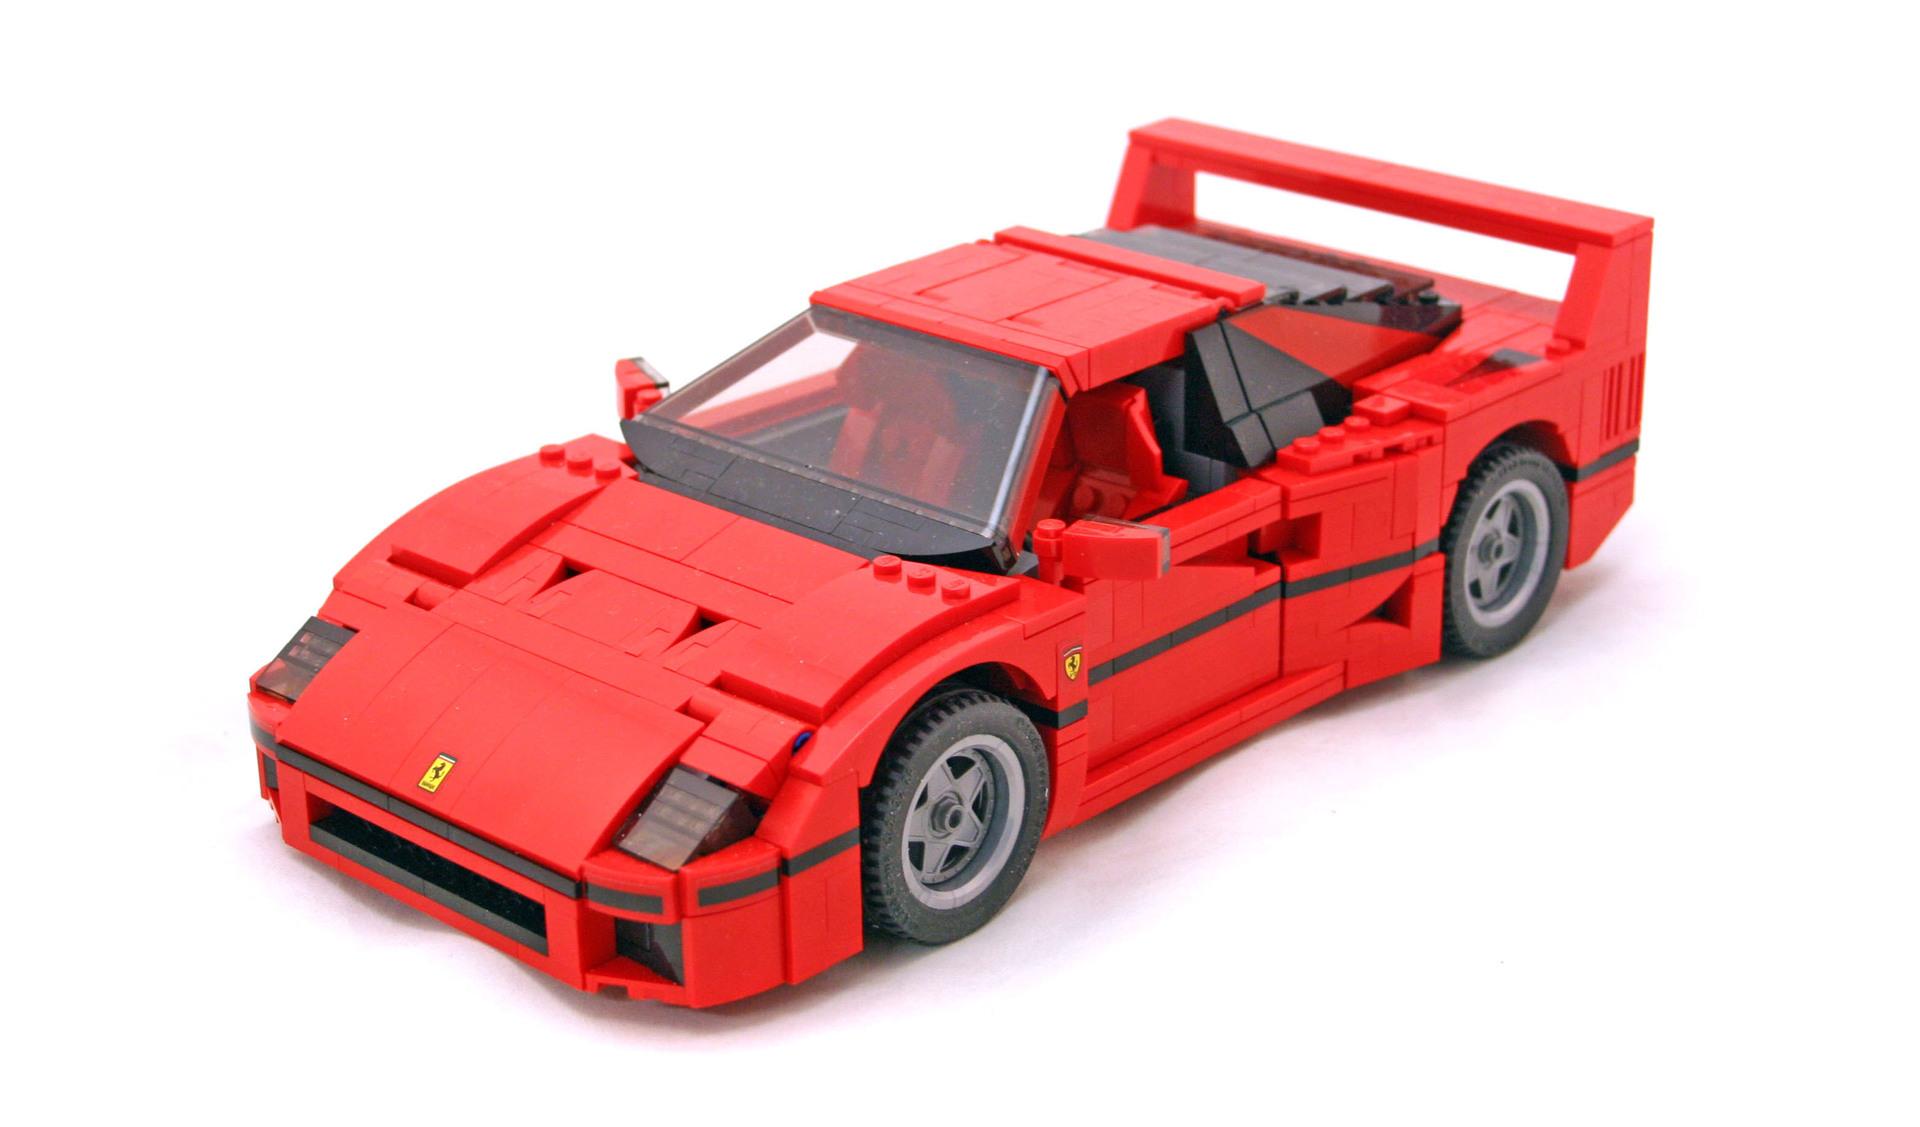 Ferrari F40 For Sale >> Ferrari F40 - LEGO set #10248-1 (Building Sets > Creator)